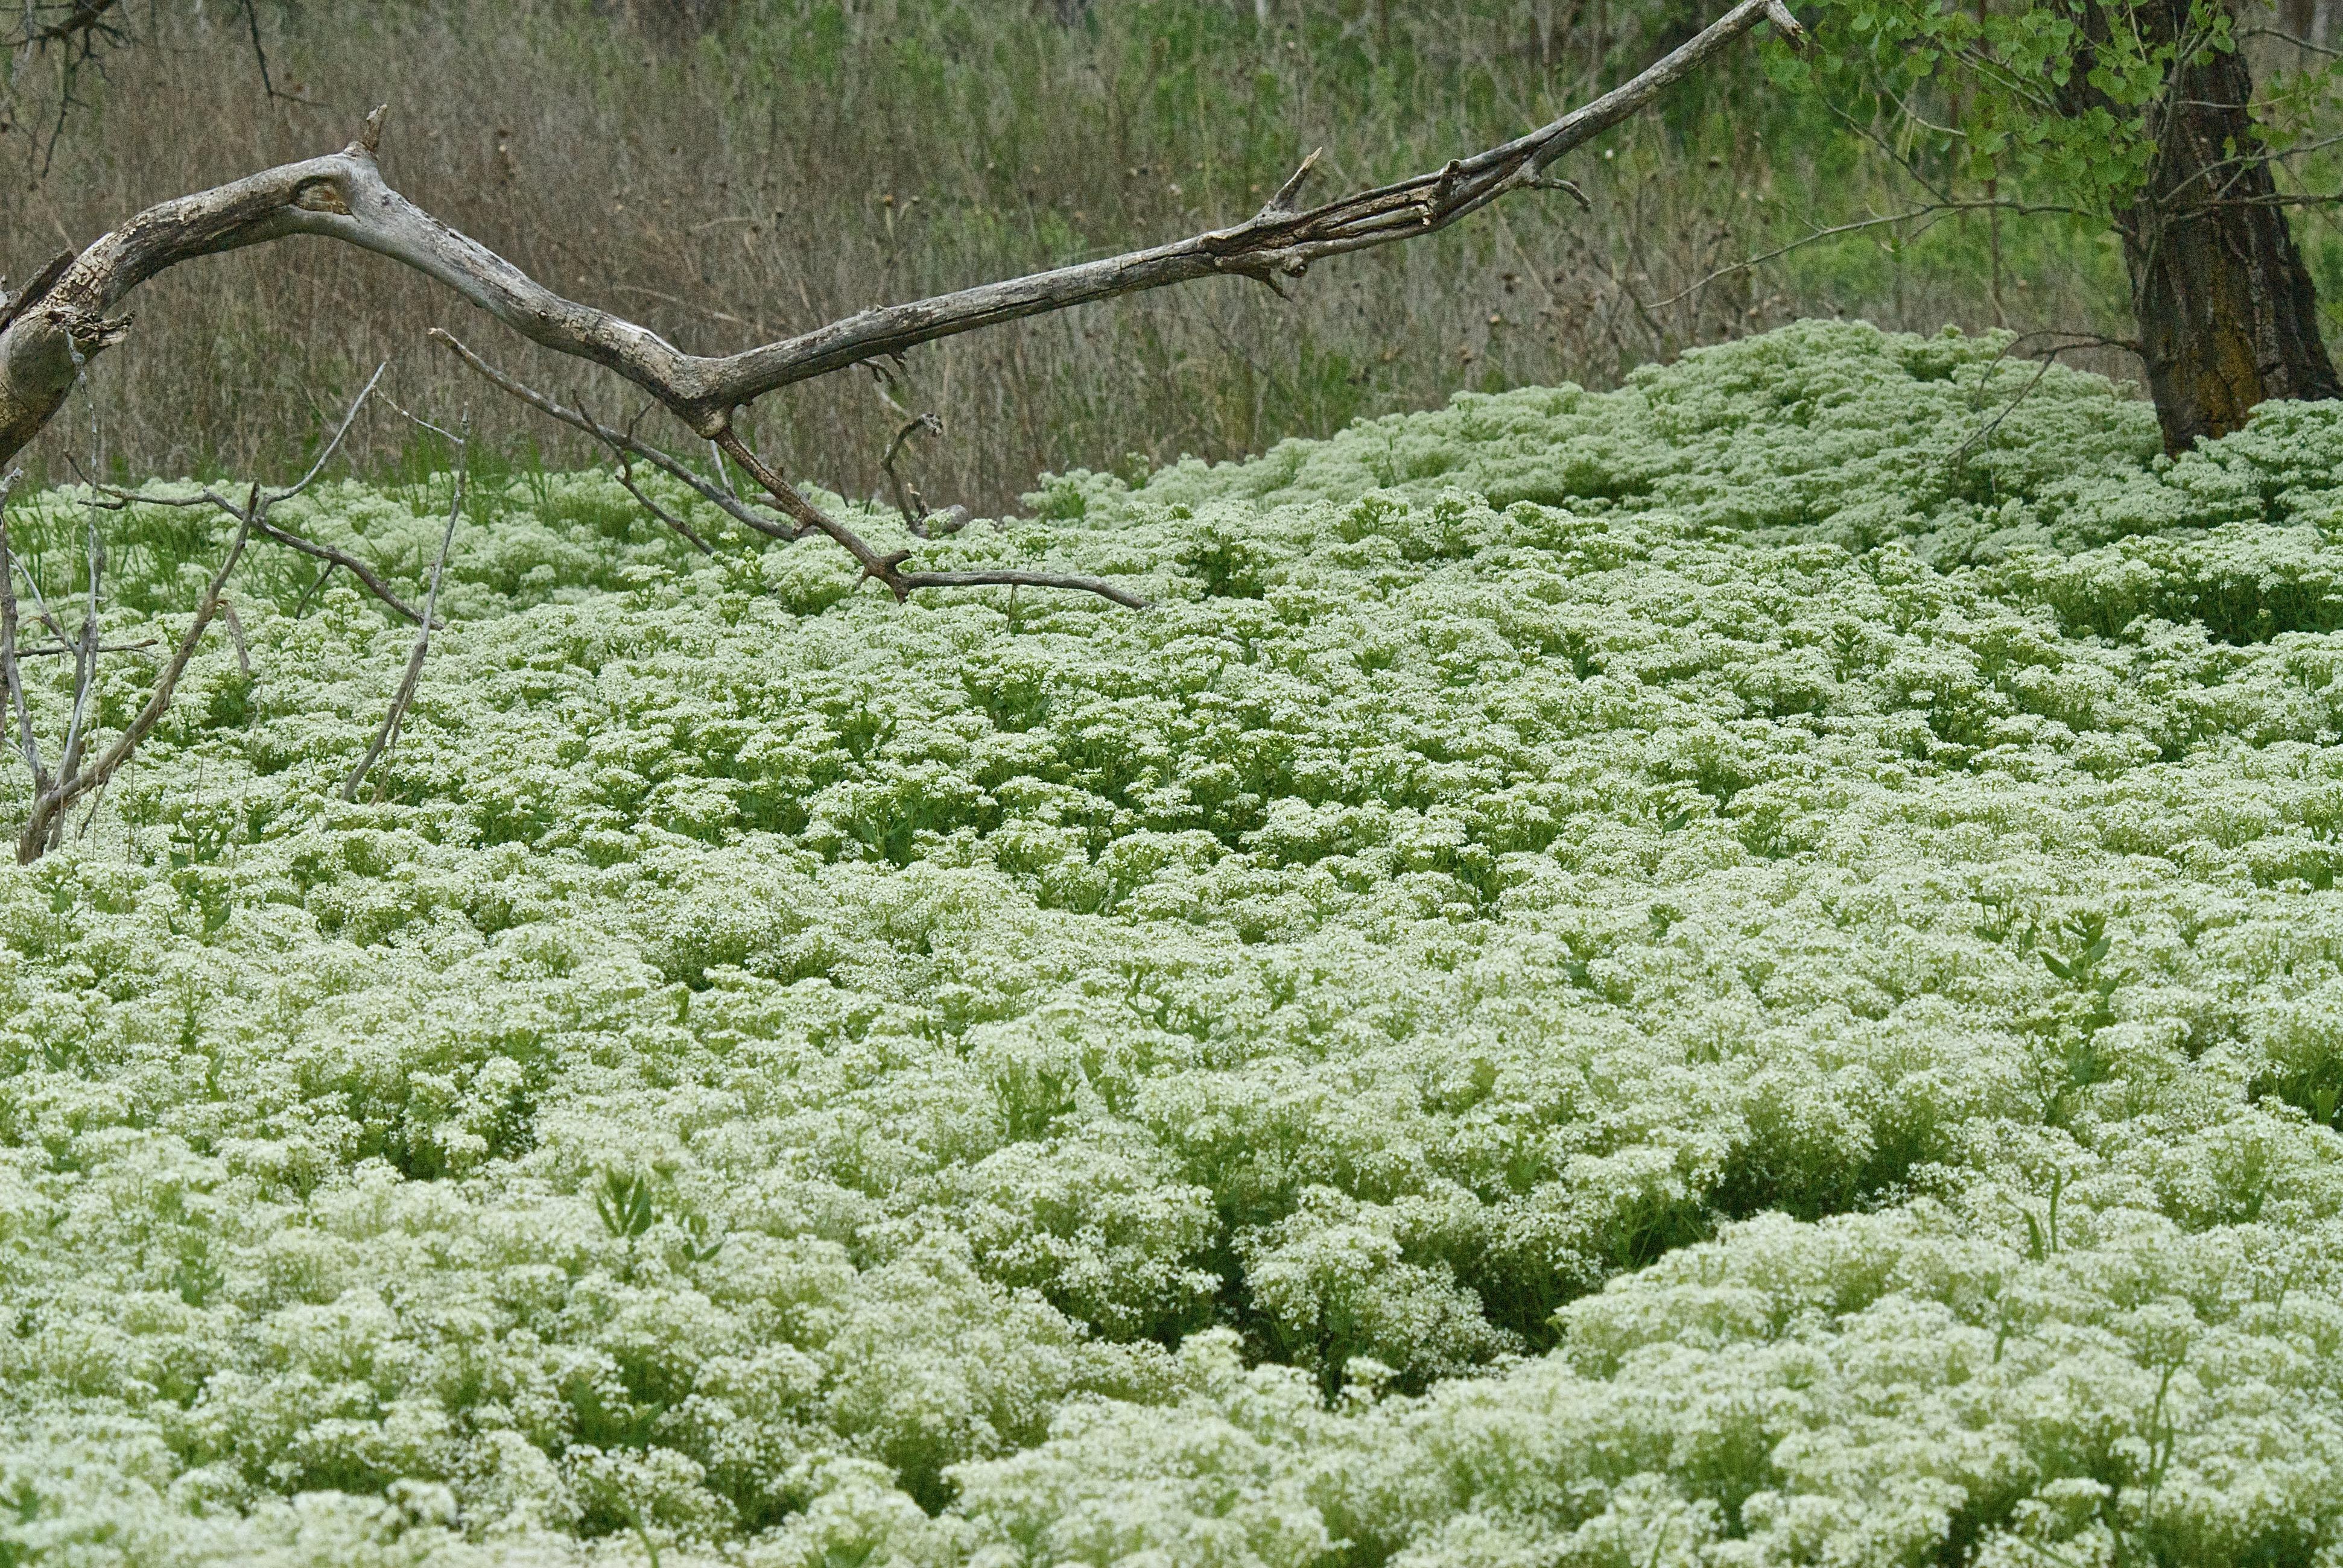 Hoary Cress (Leidium draba ssp. draba)